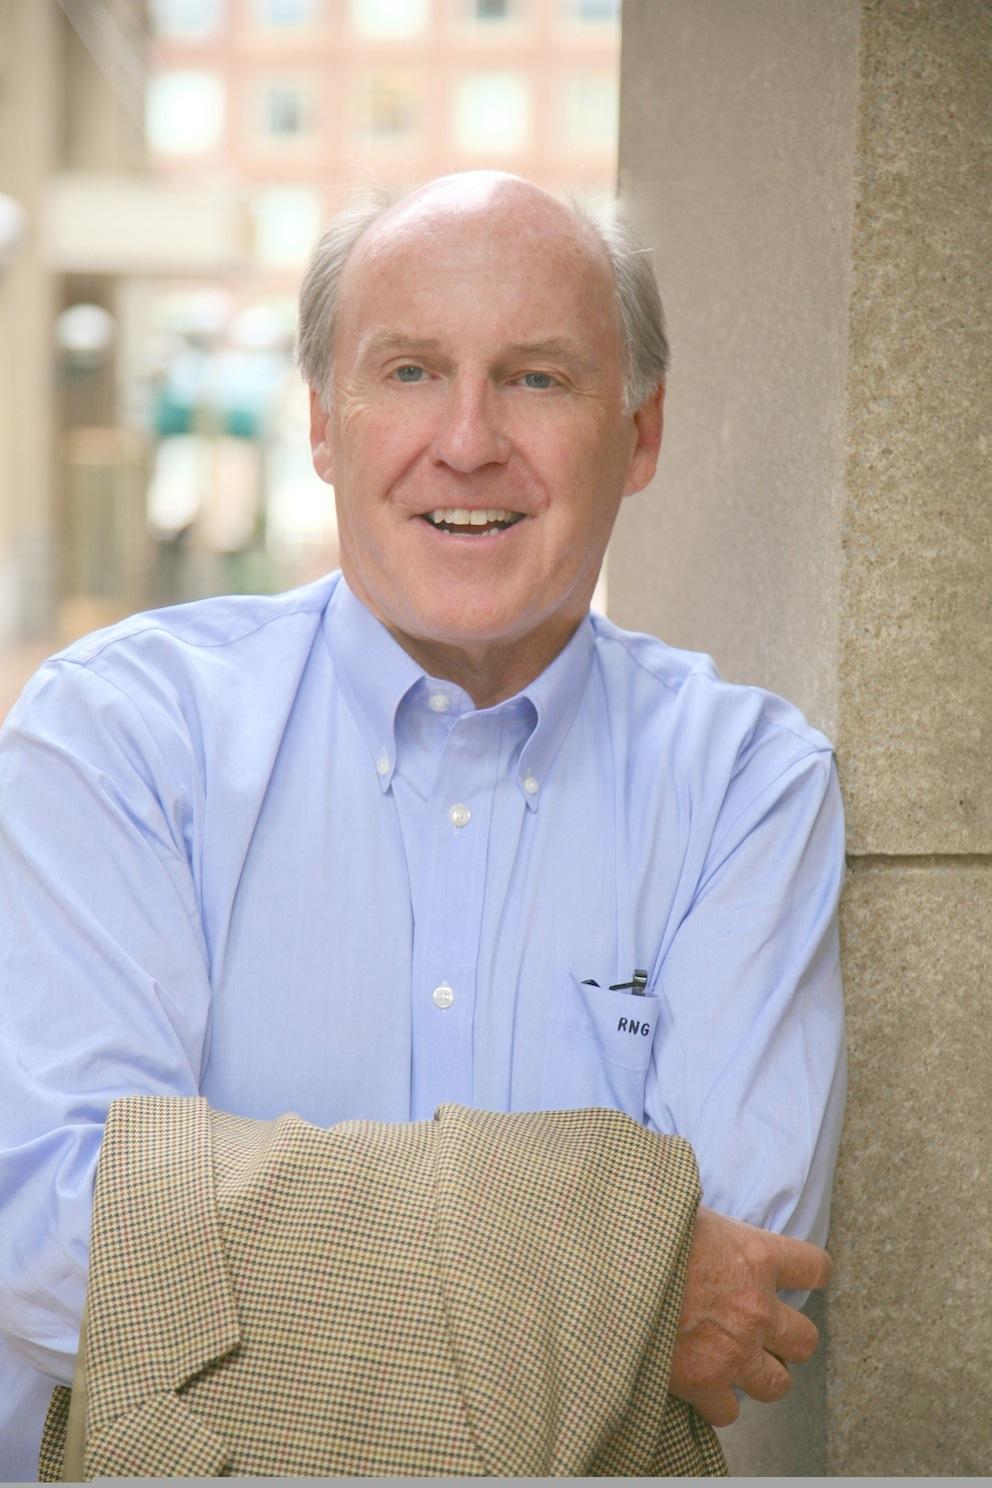 Roger Good